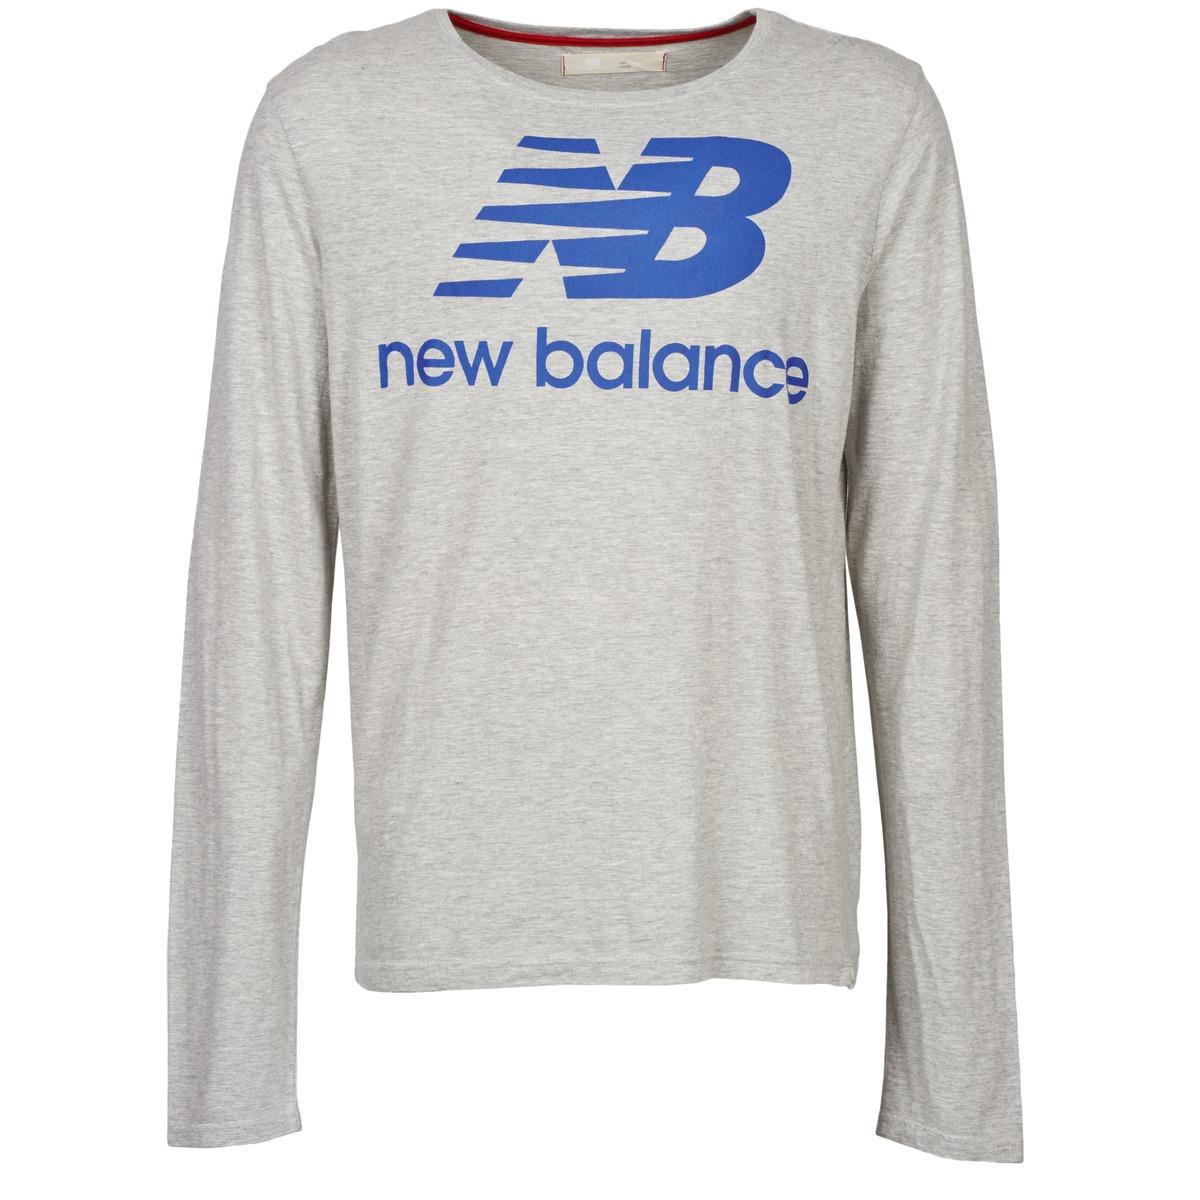 New Balance NBSS1403 LONG SLEEVE TEE Grey